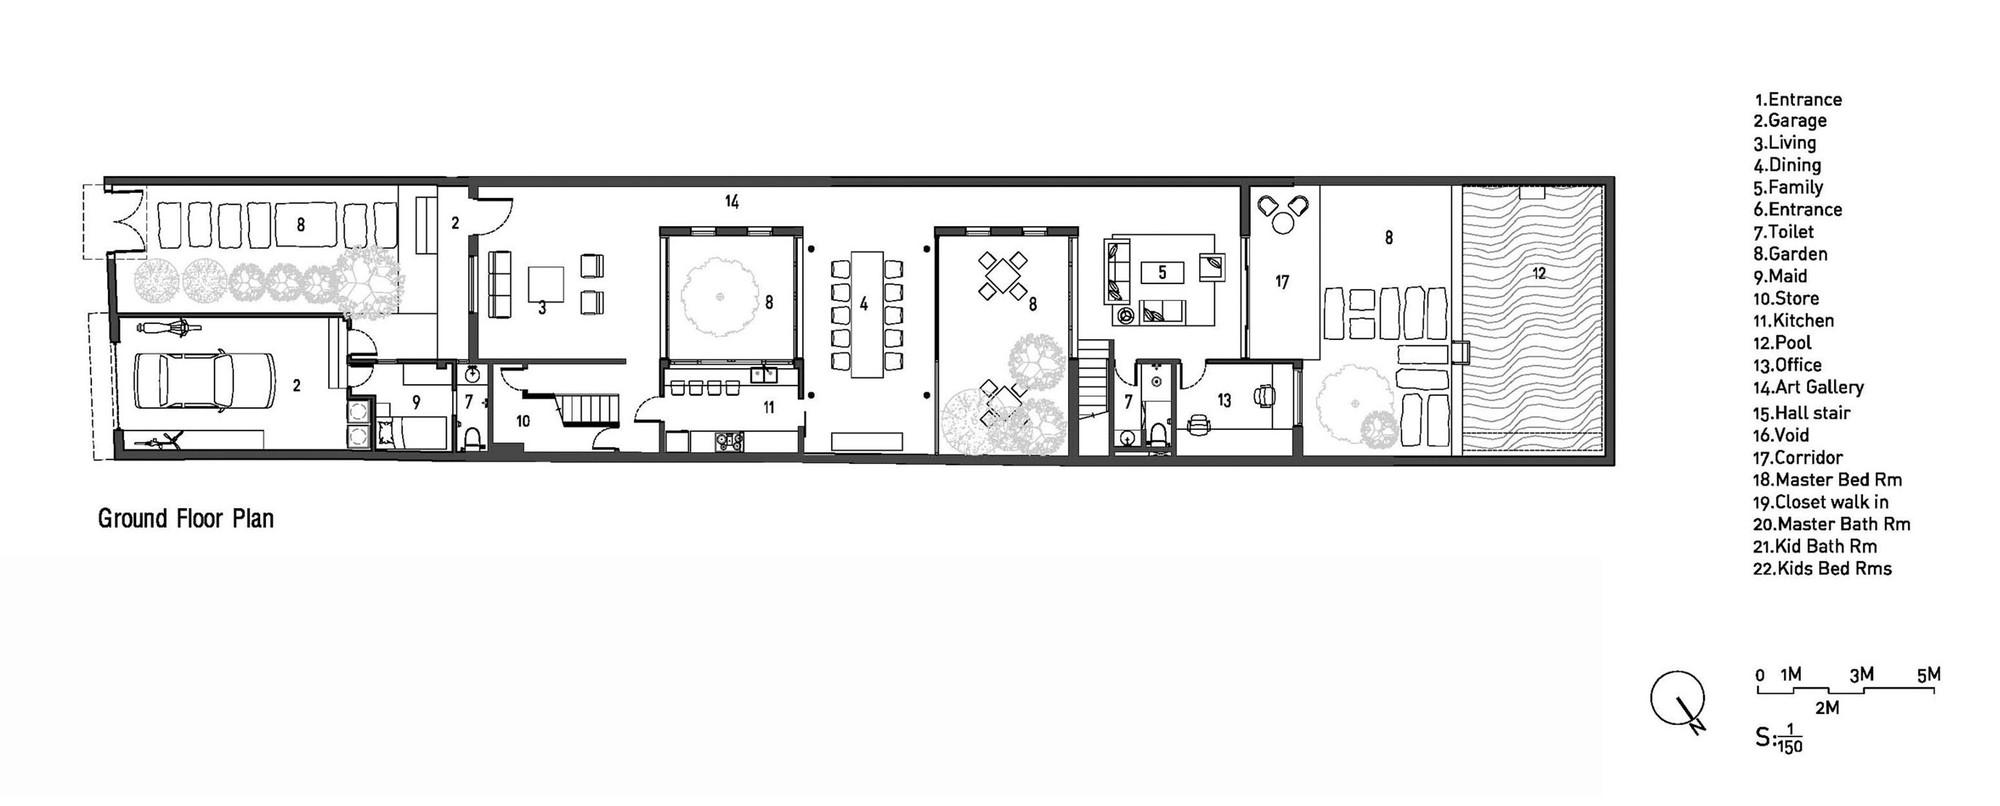 Mặt bằng - Modern Tube House - 1